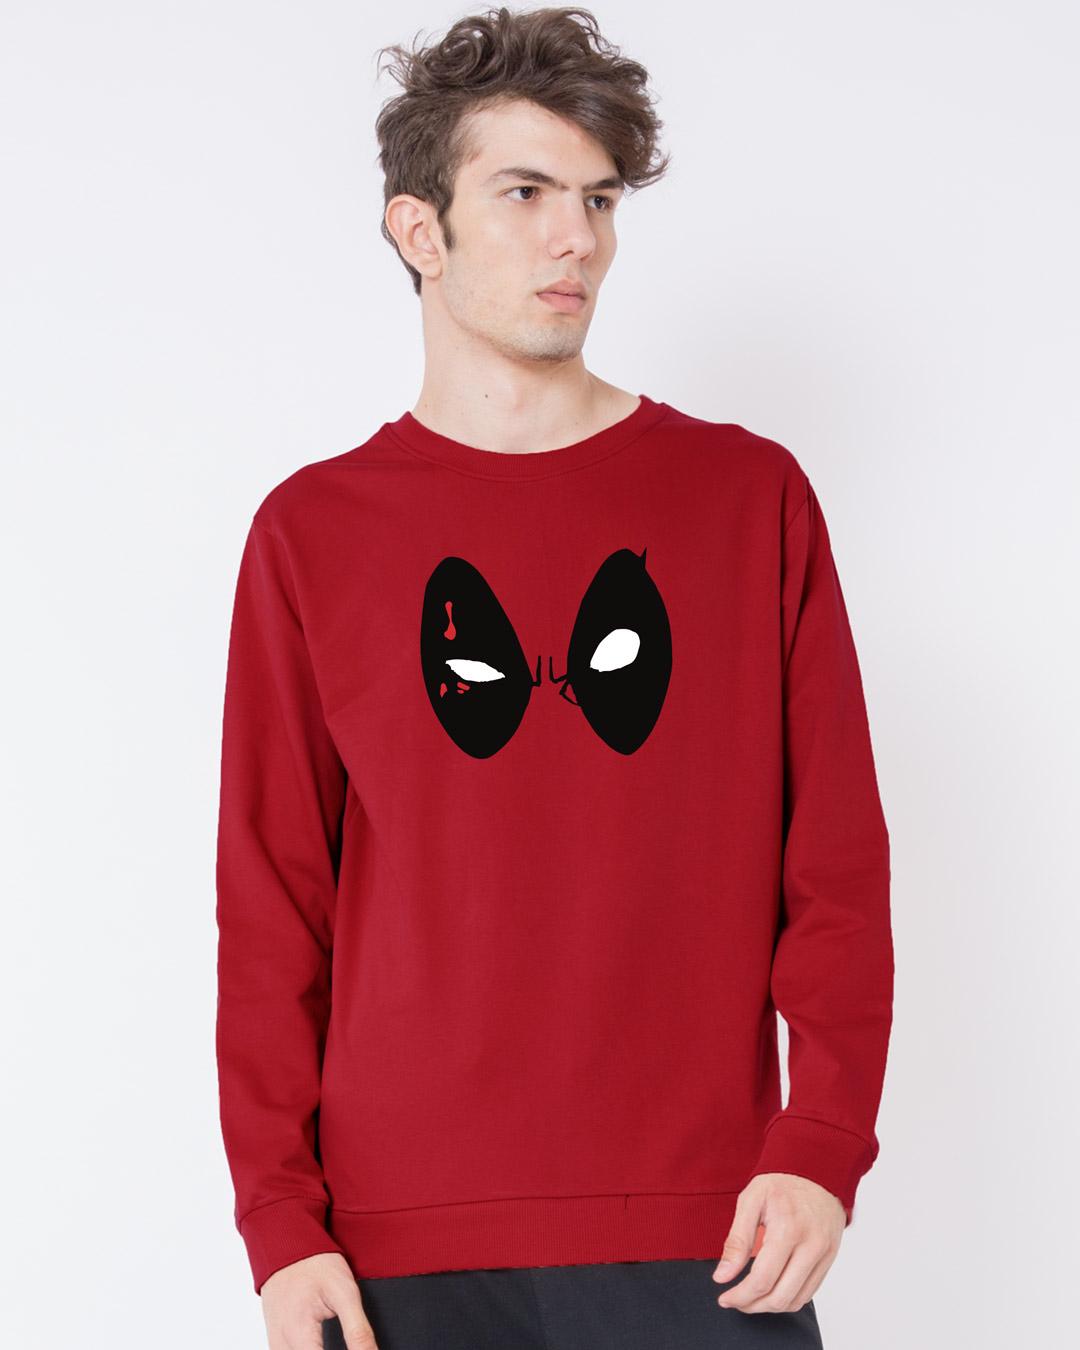 Deadpool Eyes Sweatshirt